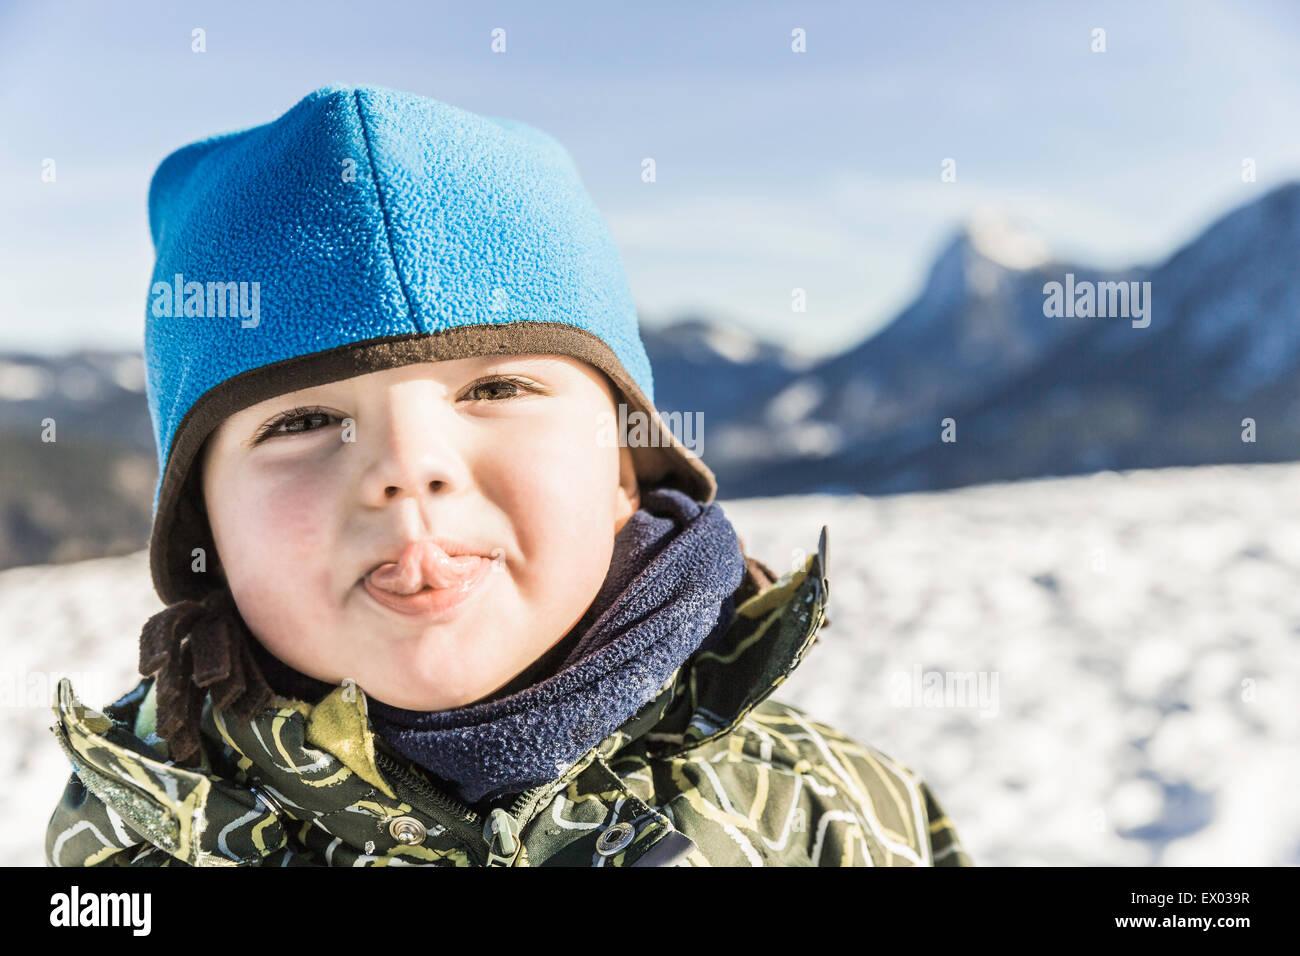 Toddler sticking out tongue, Achenkirch, Tirol, Austria - Stock Image